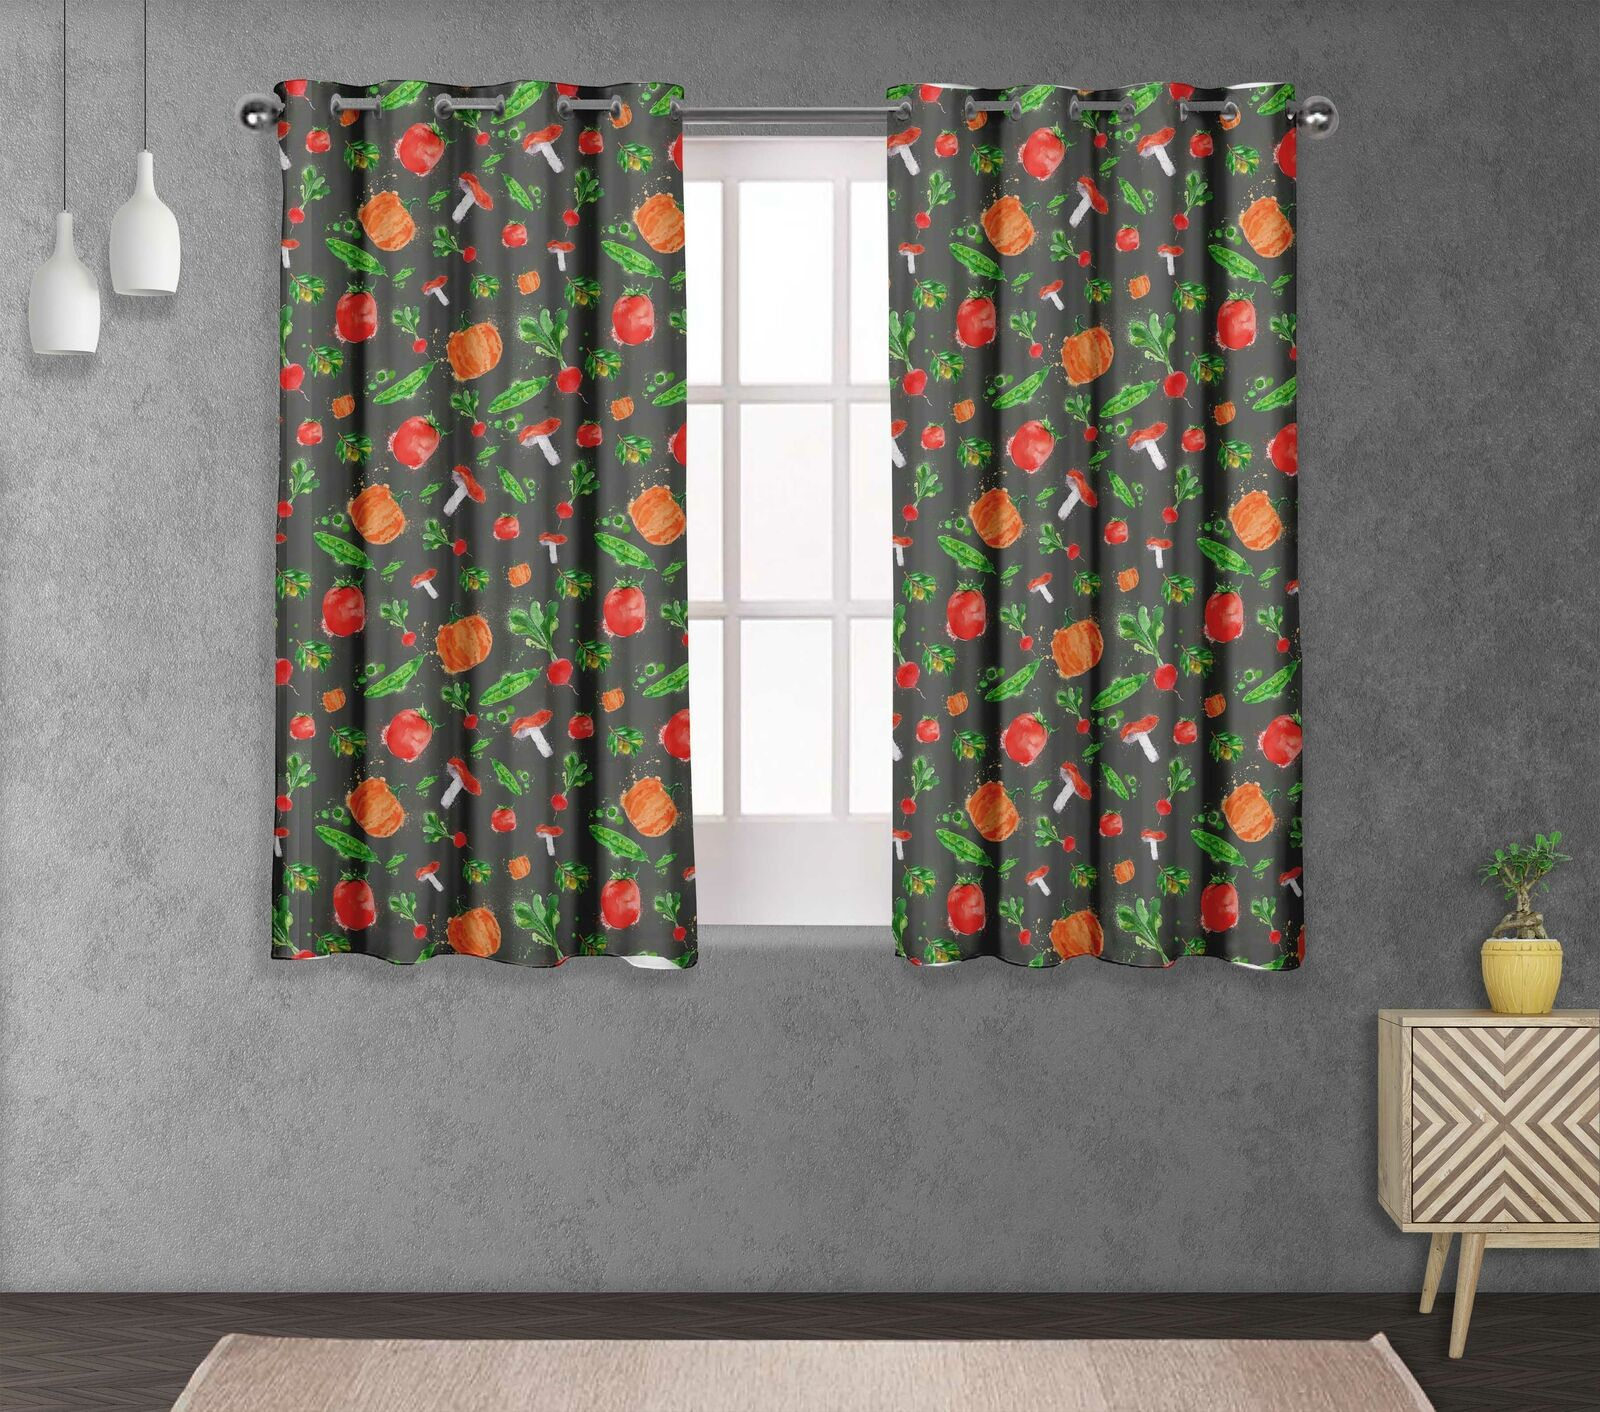 S4sassy Mixed Double Panel Window Treatment Curtain -VG-511F